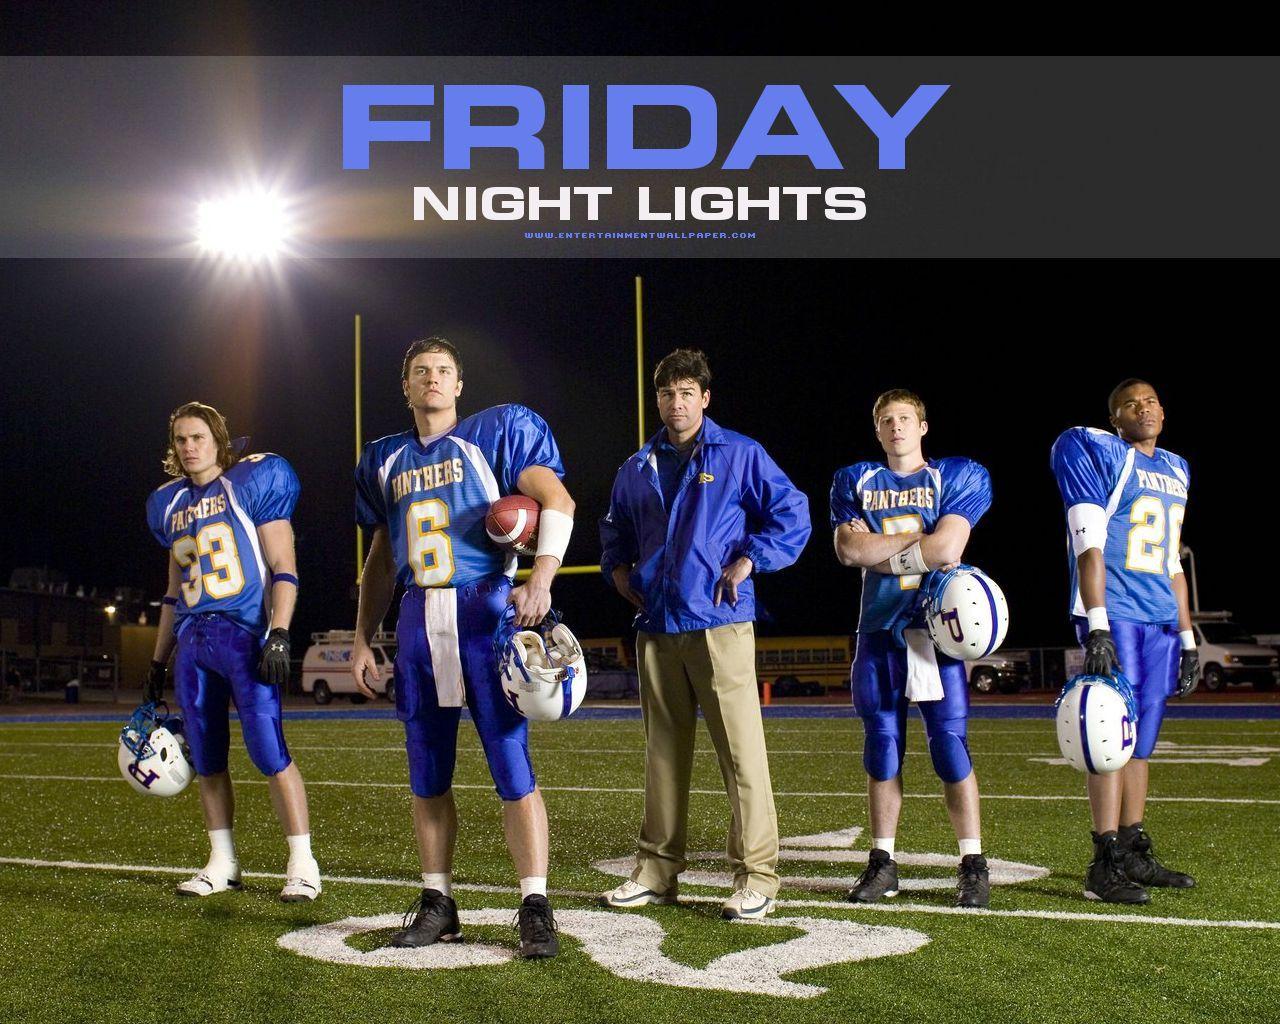 Tv Series Friday Night Lights